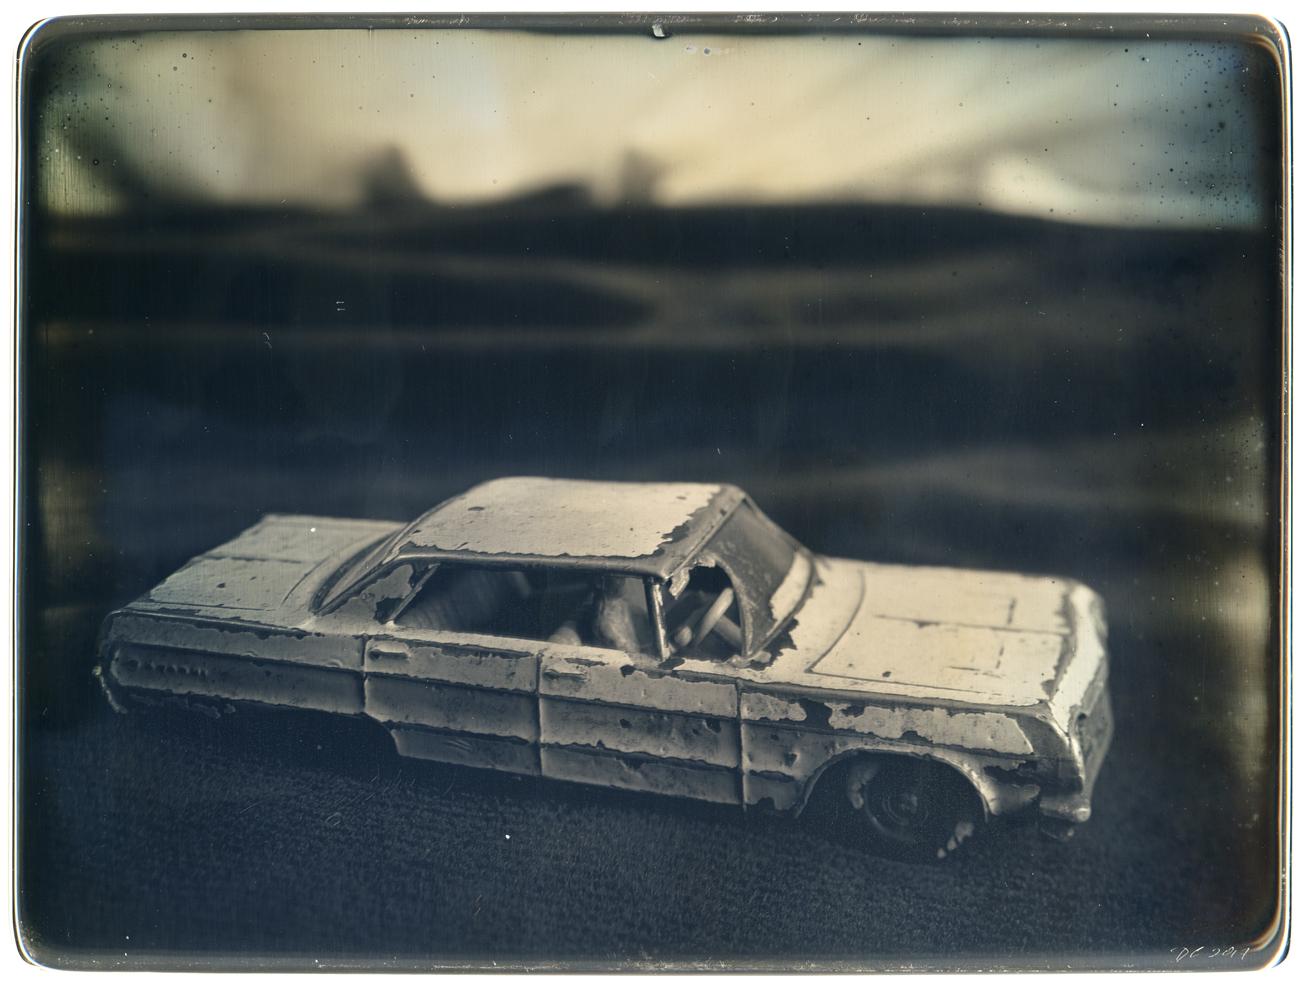 Daniel Carrillo, Vic Haven's 1965 Impala, 2017, daguerreotype, 6.5 x 8.5 inches, framed, $3000.